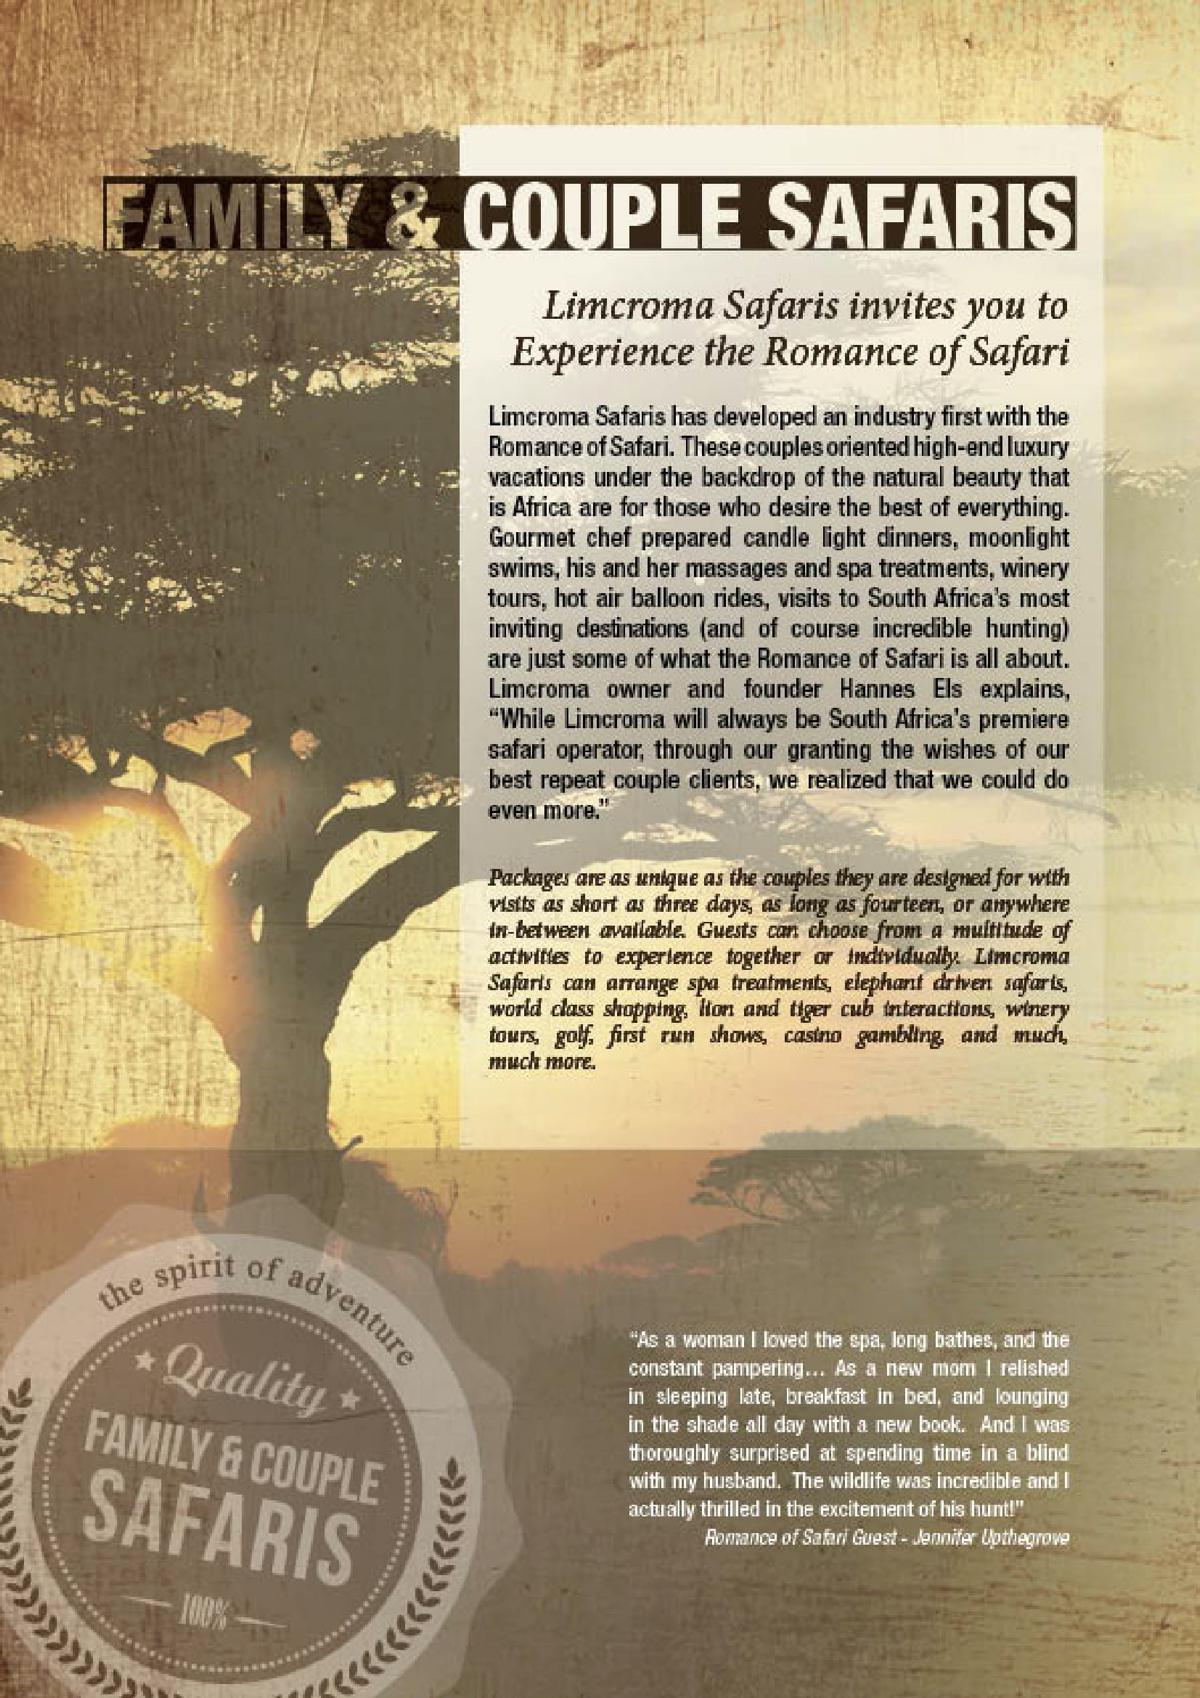 limcroma-safaris-16.jpg